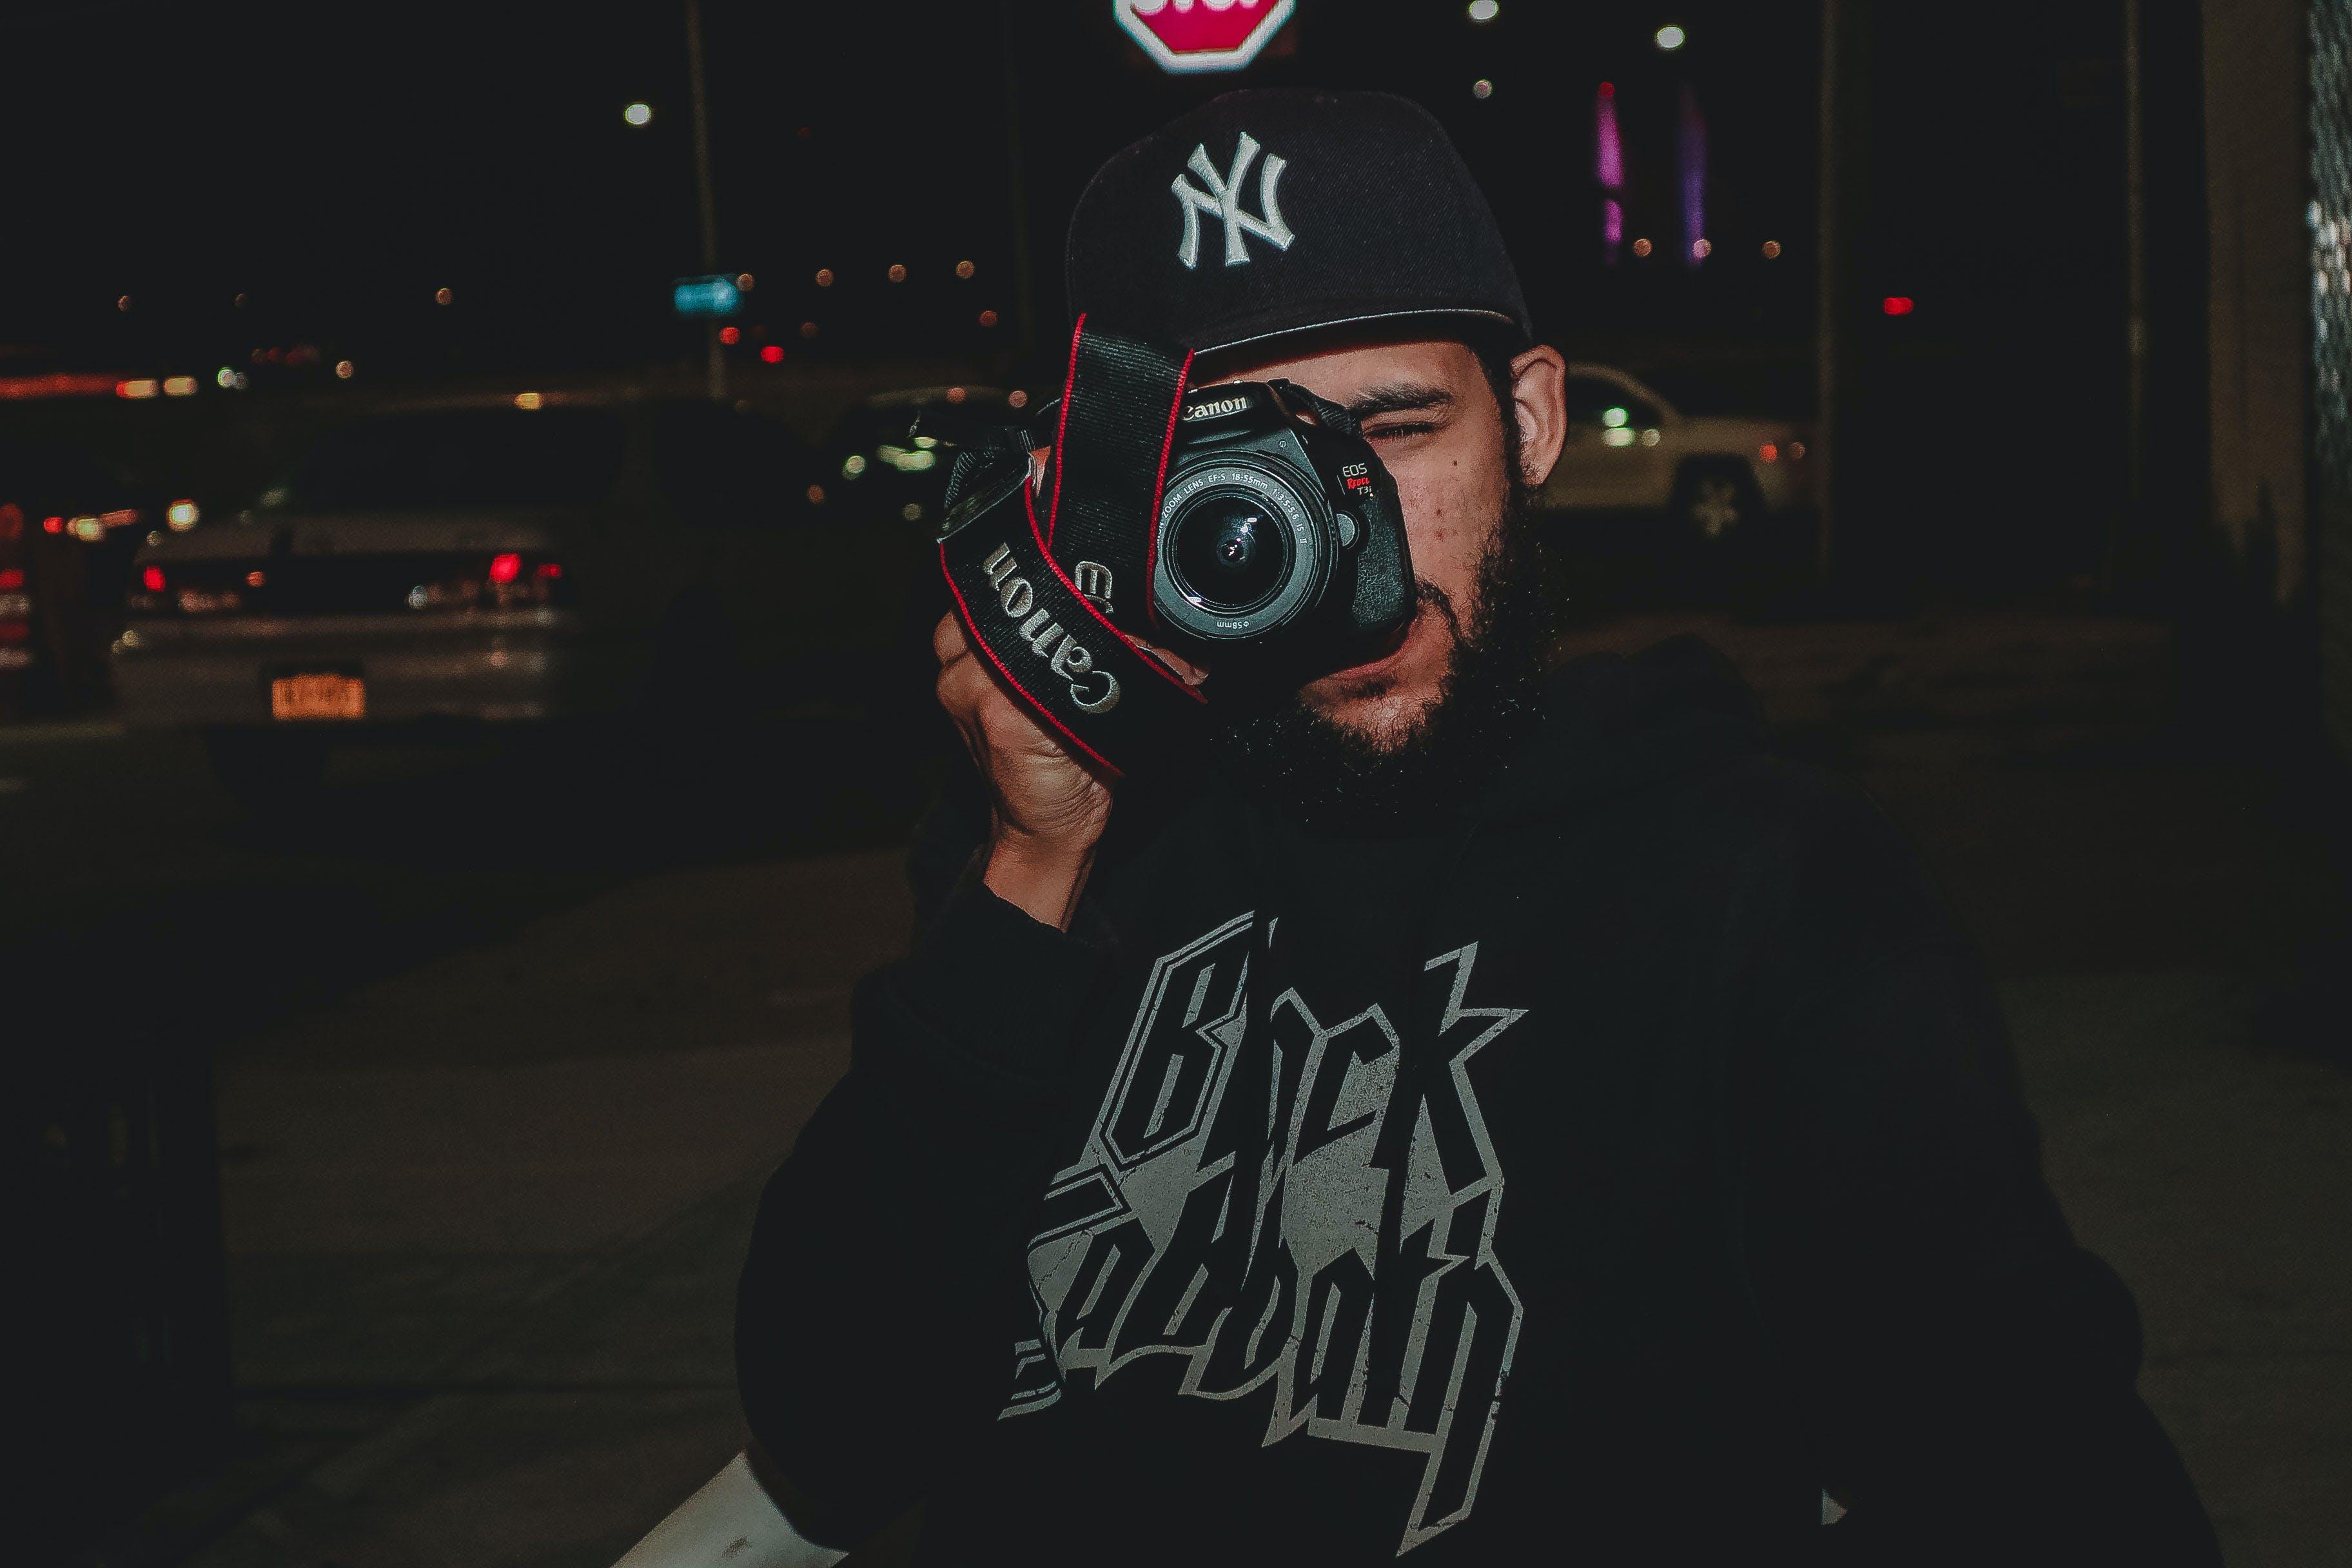 Man Taking Picture Using Canon Dslr Camera